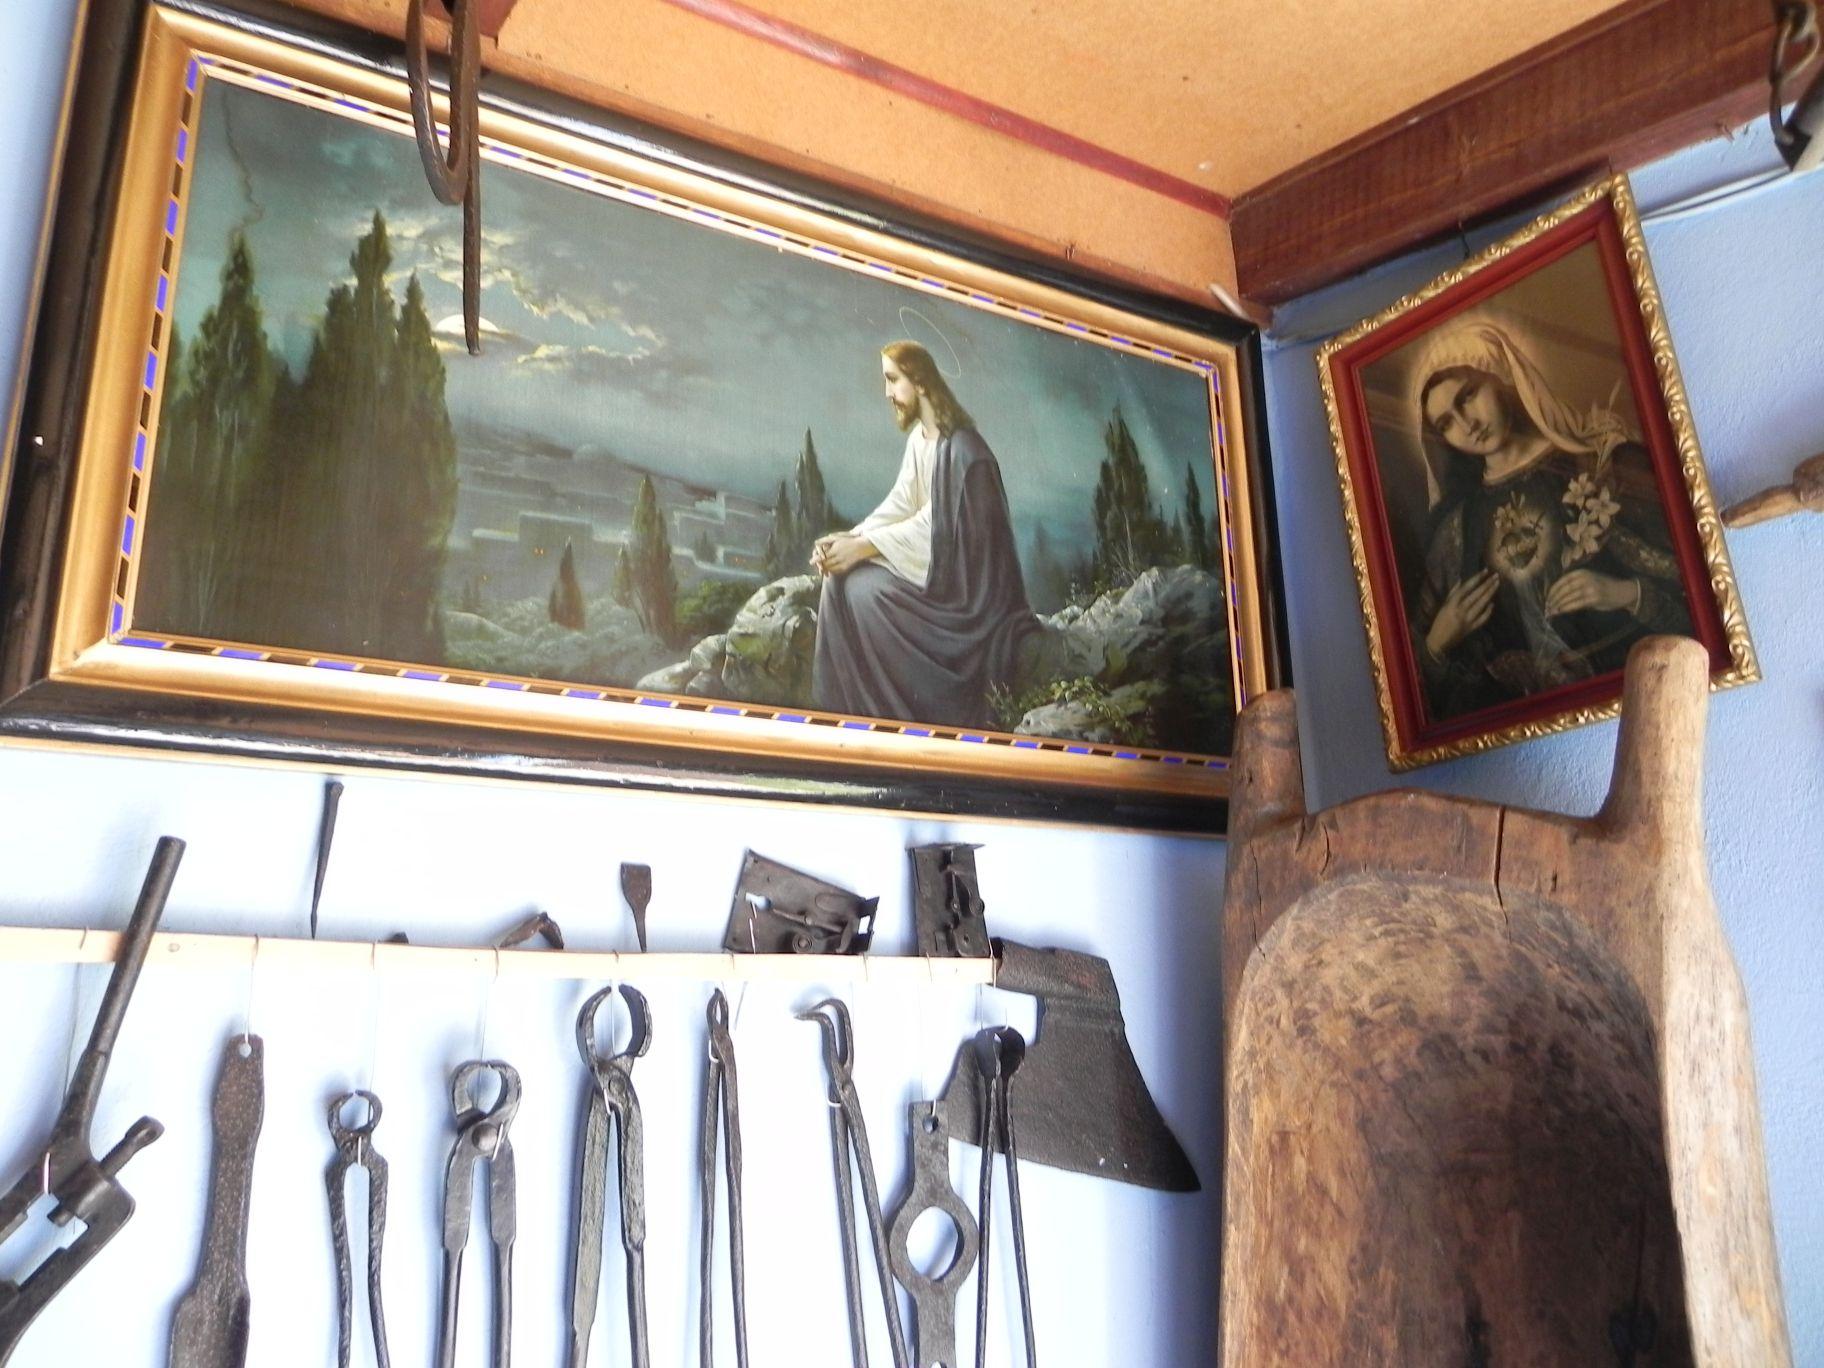 2012-05-03 Lipce Reymontowskie - galeria staroci (28)